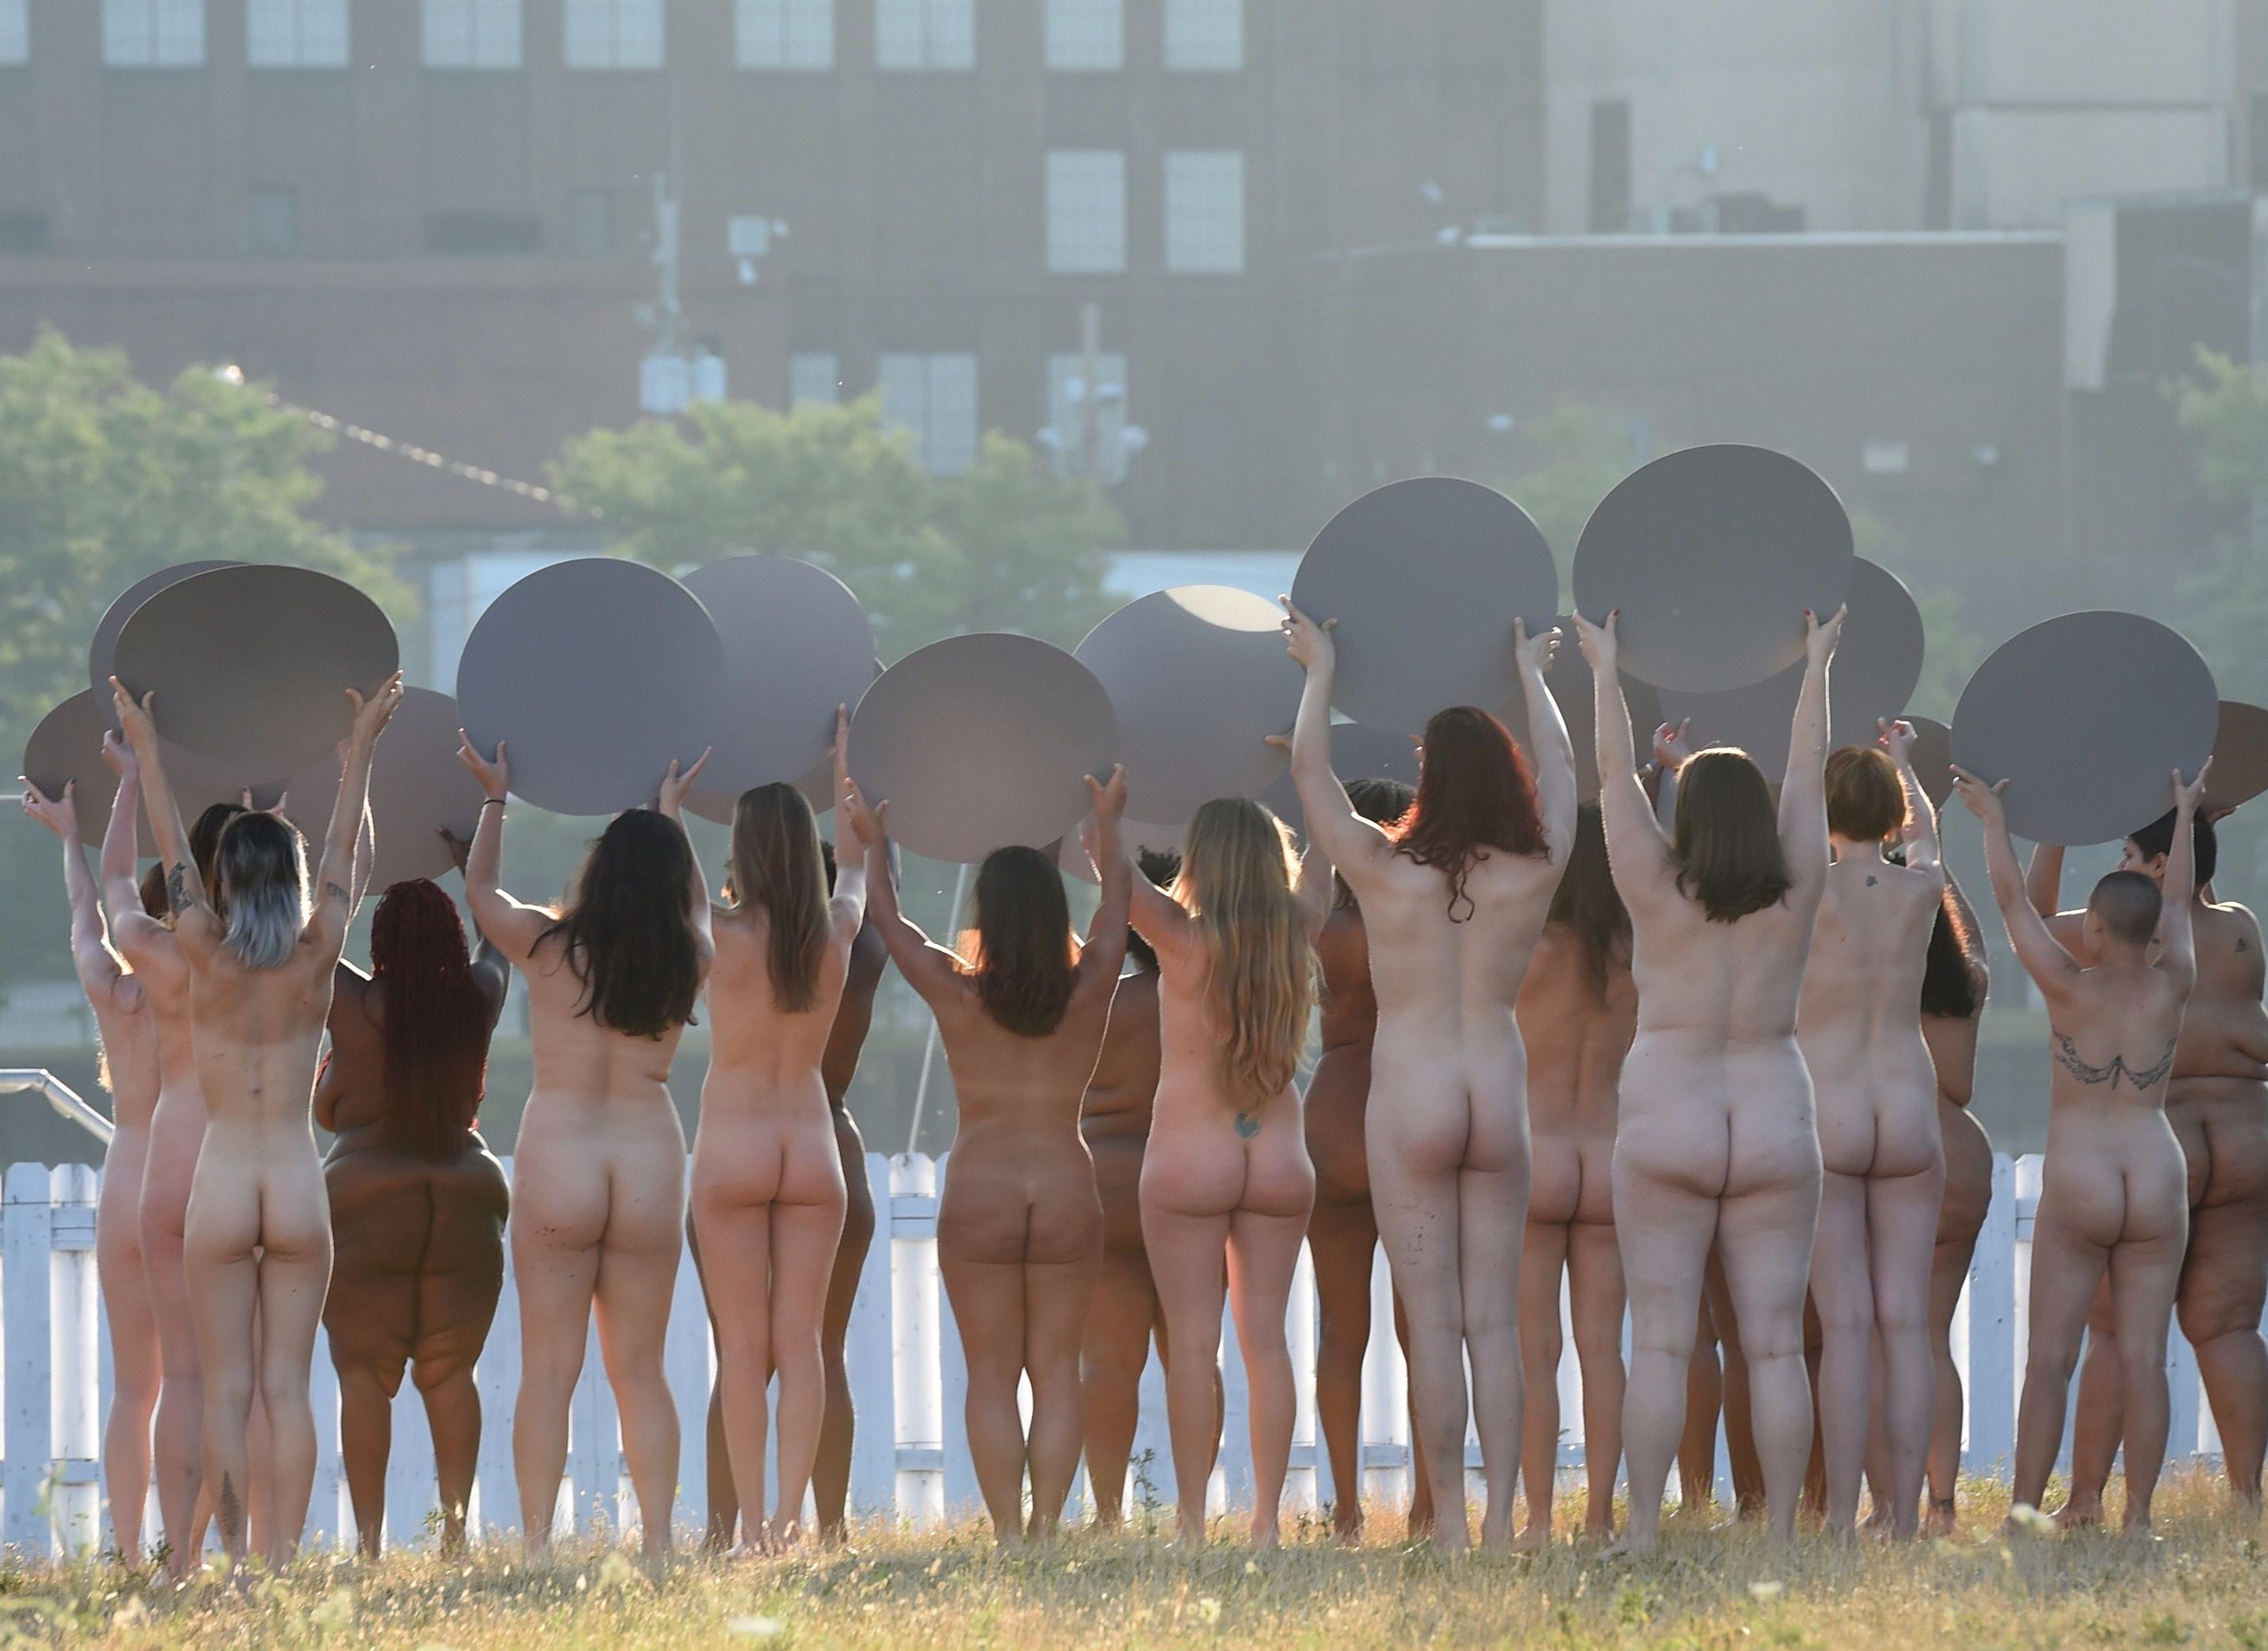 women Nude republican